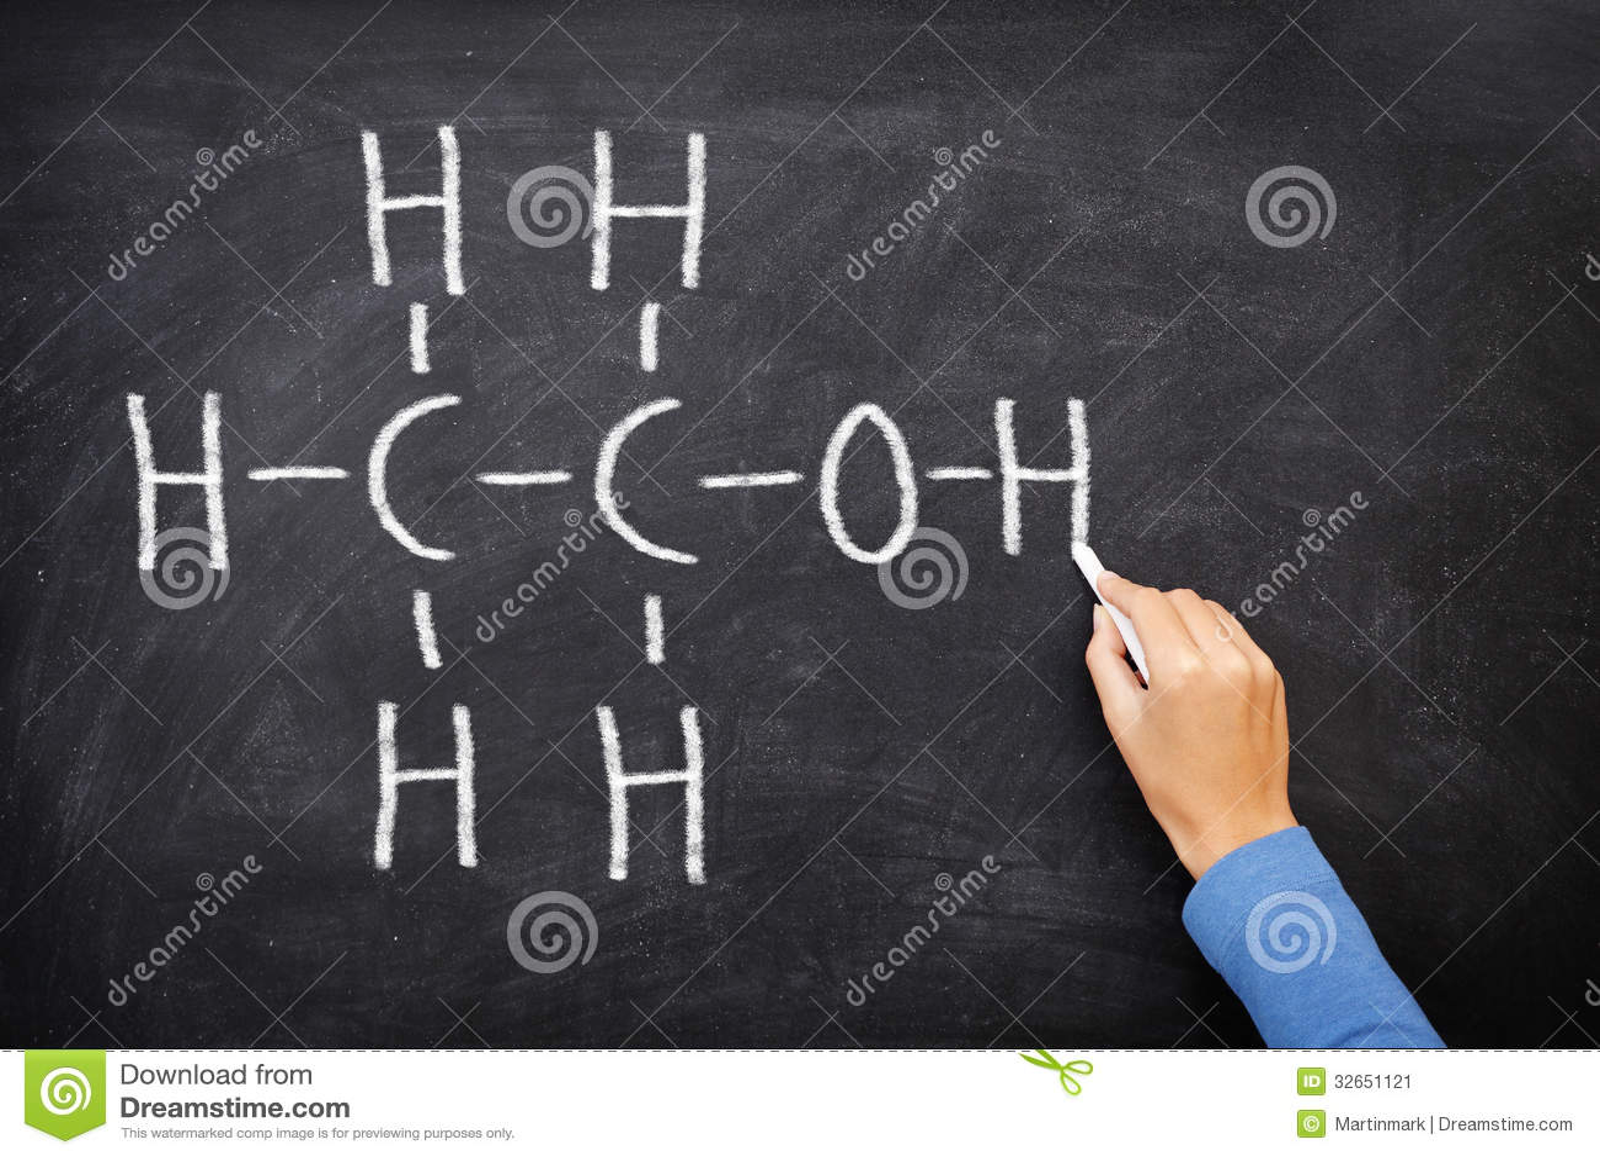 alcohol ethanol on blackboard in chemistry class stock